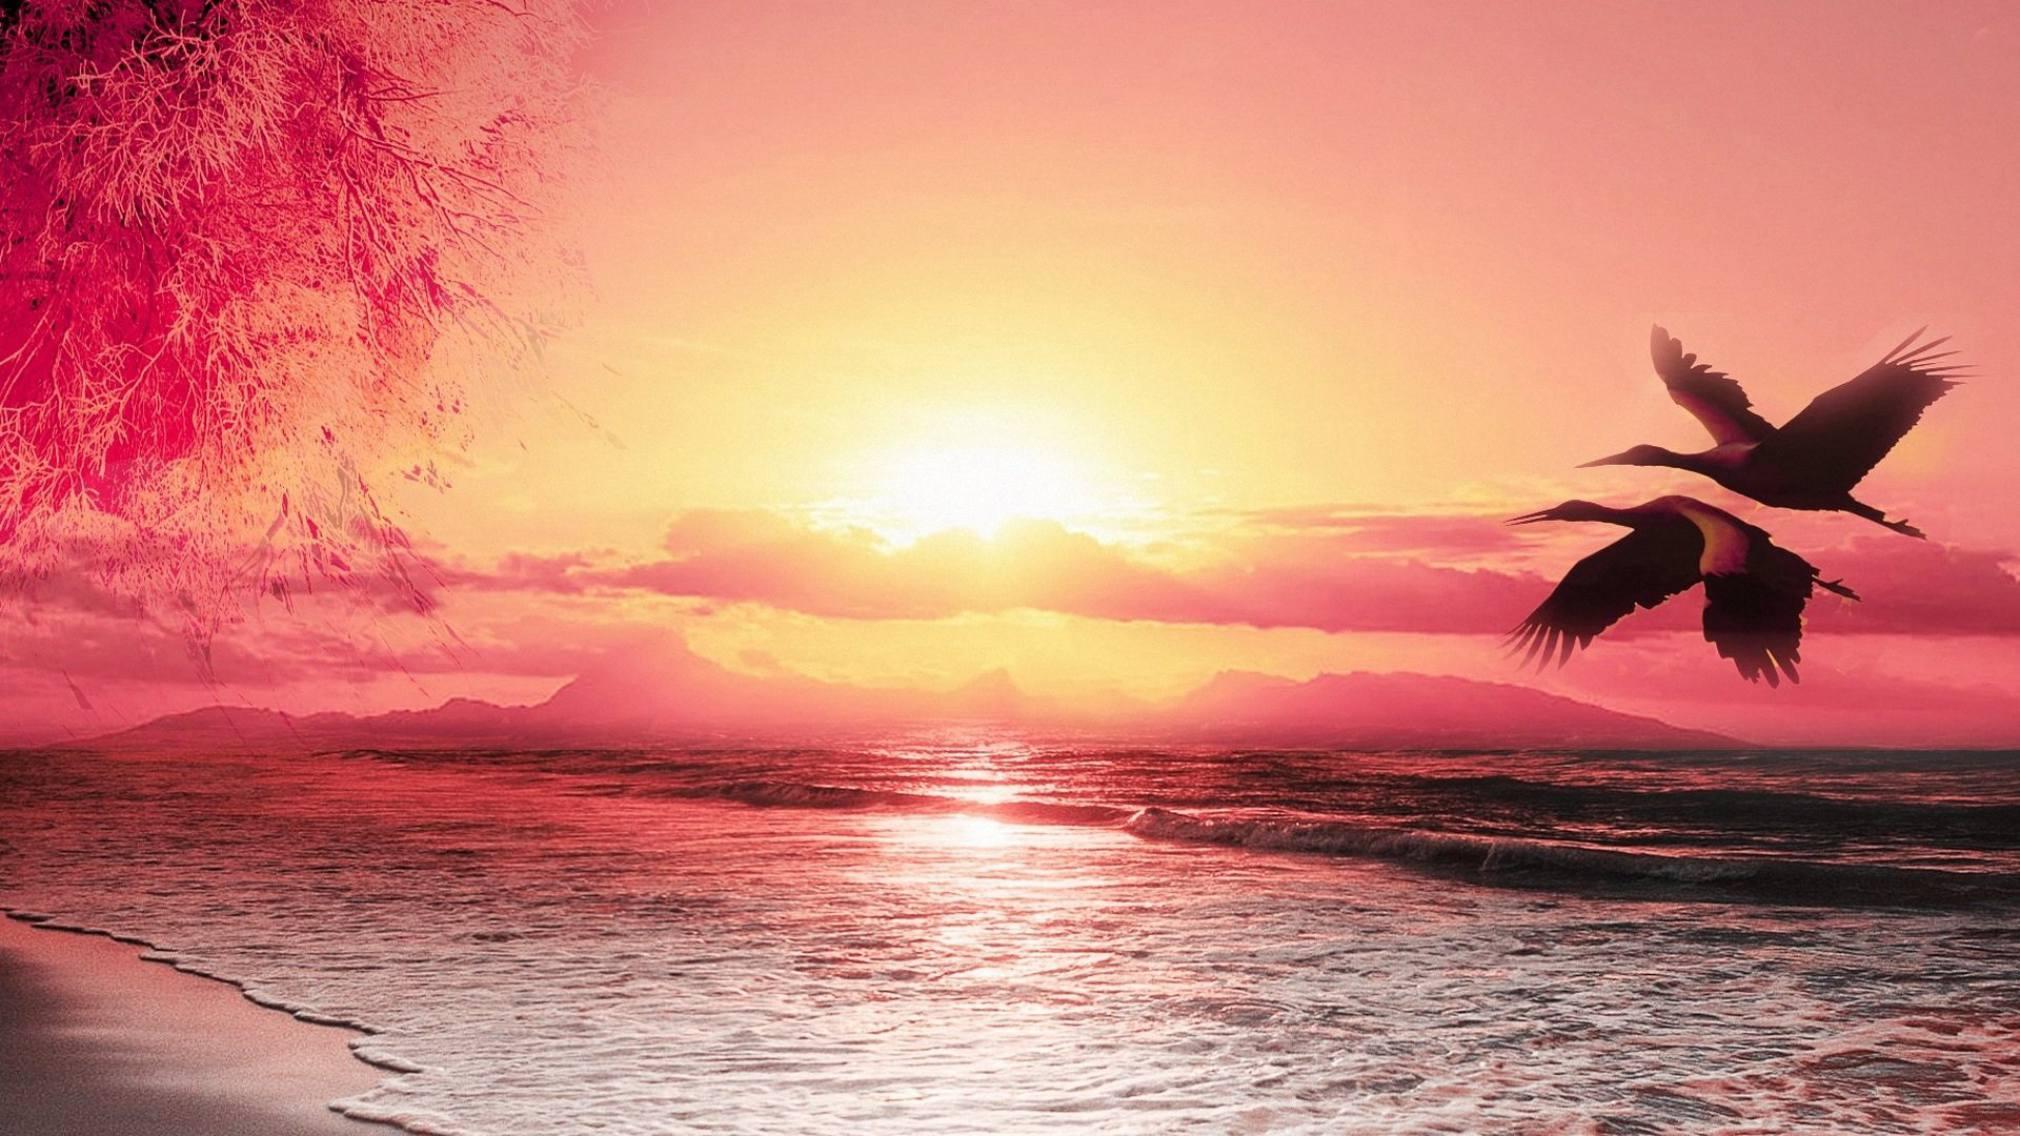 Beautiful seabirds beach sunset Scenery wallpaper material Wallpaper 2020x1136